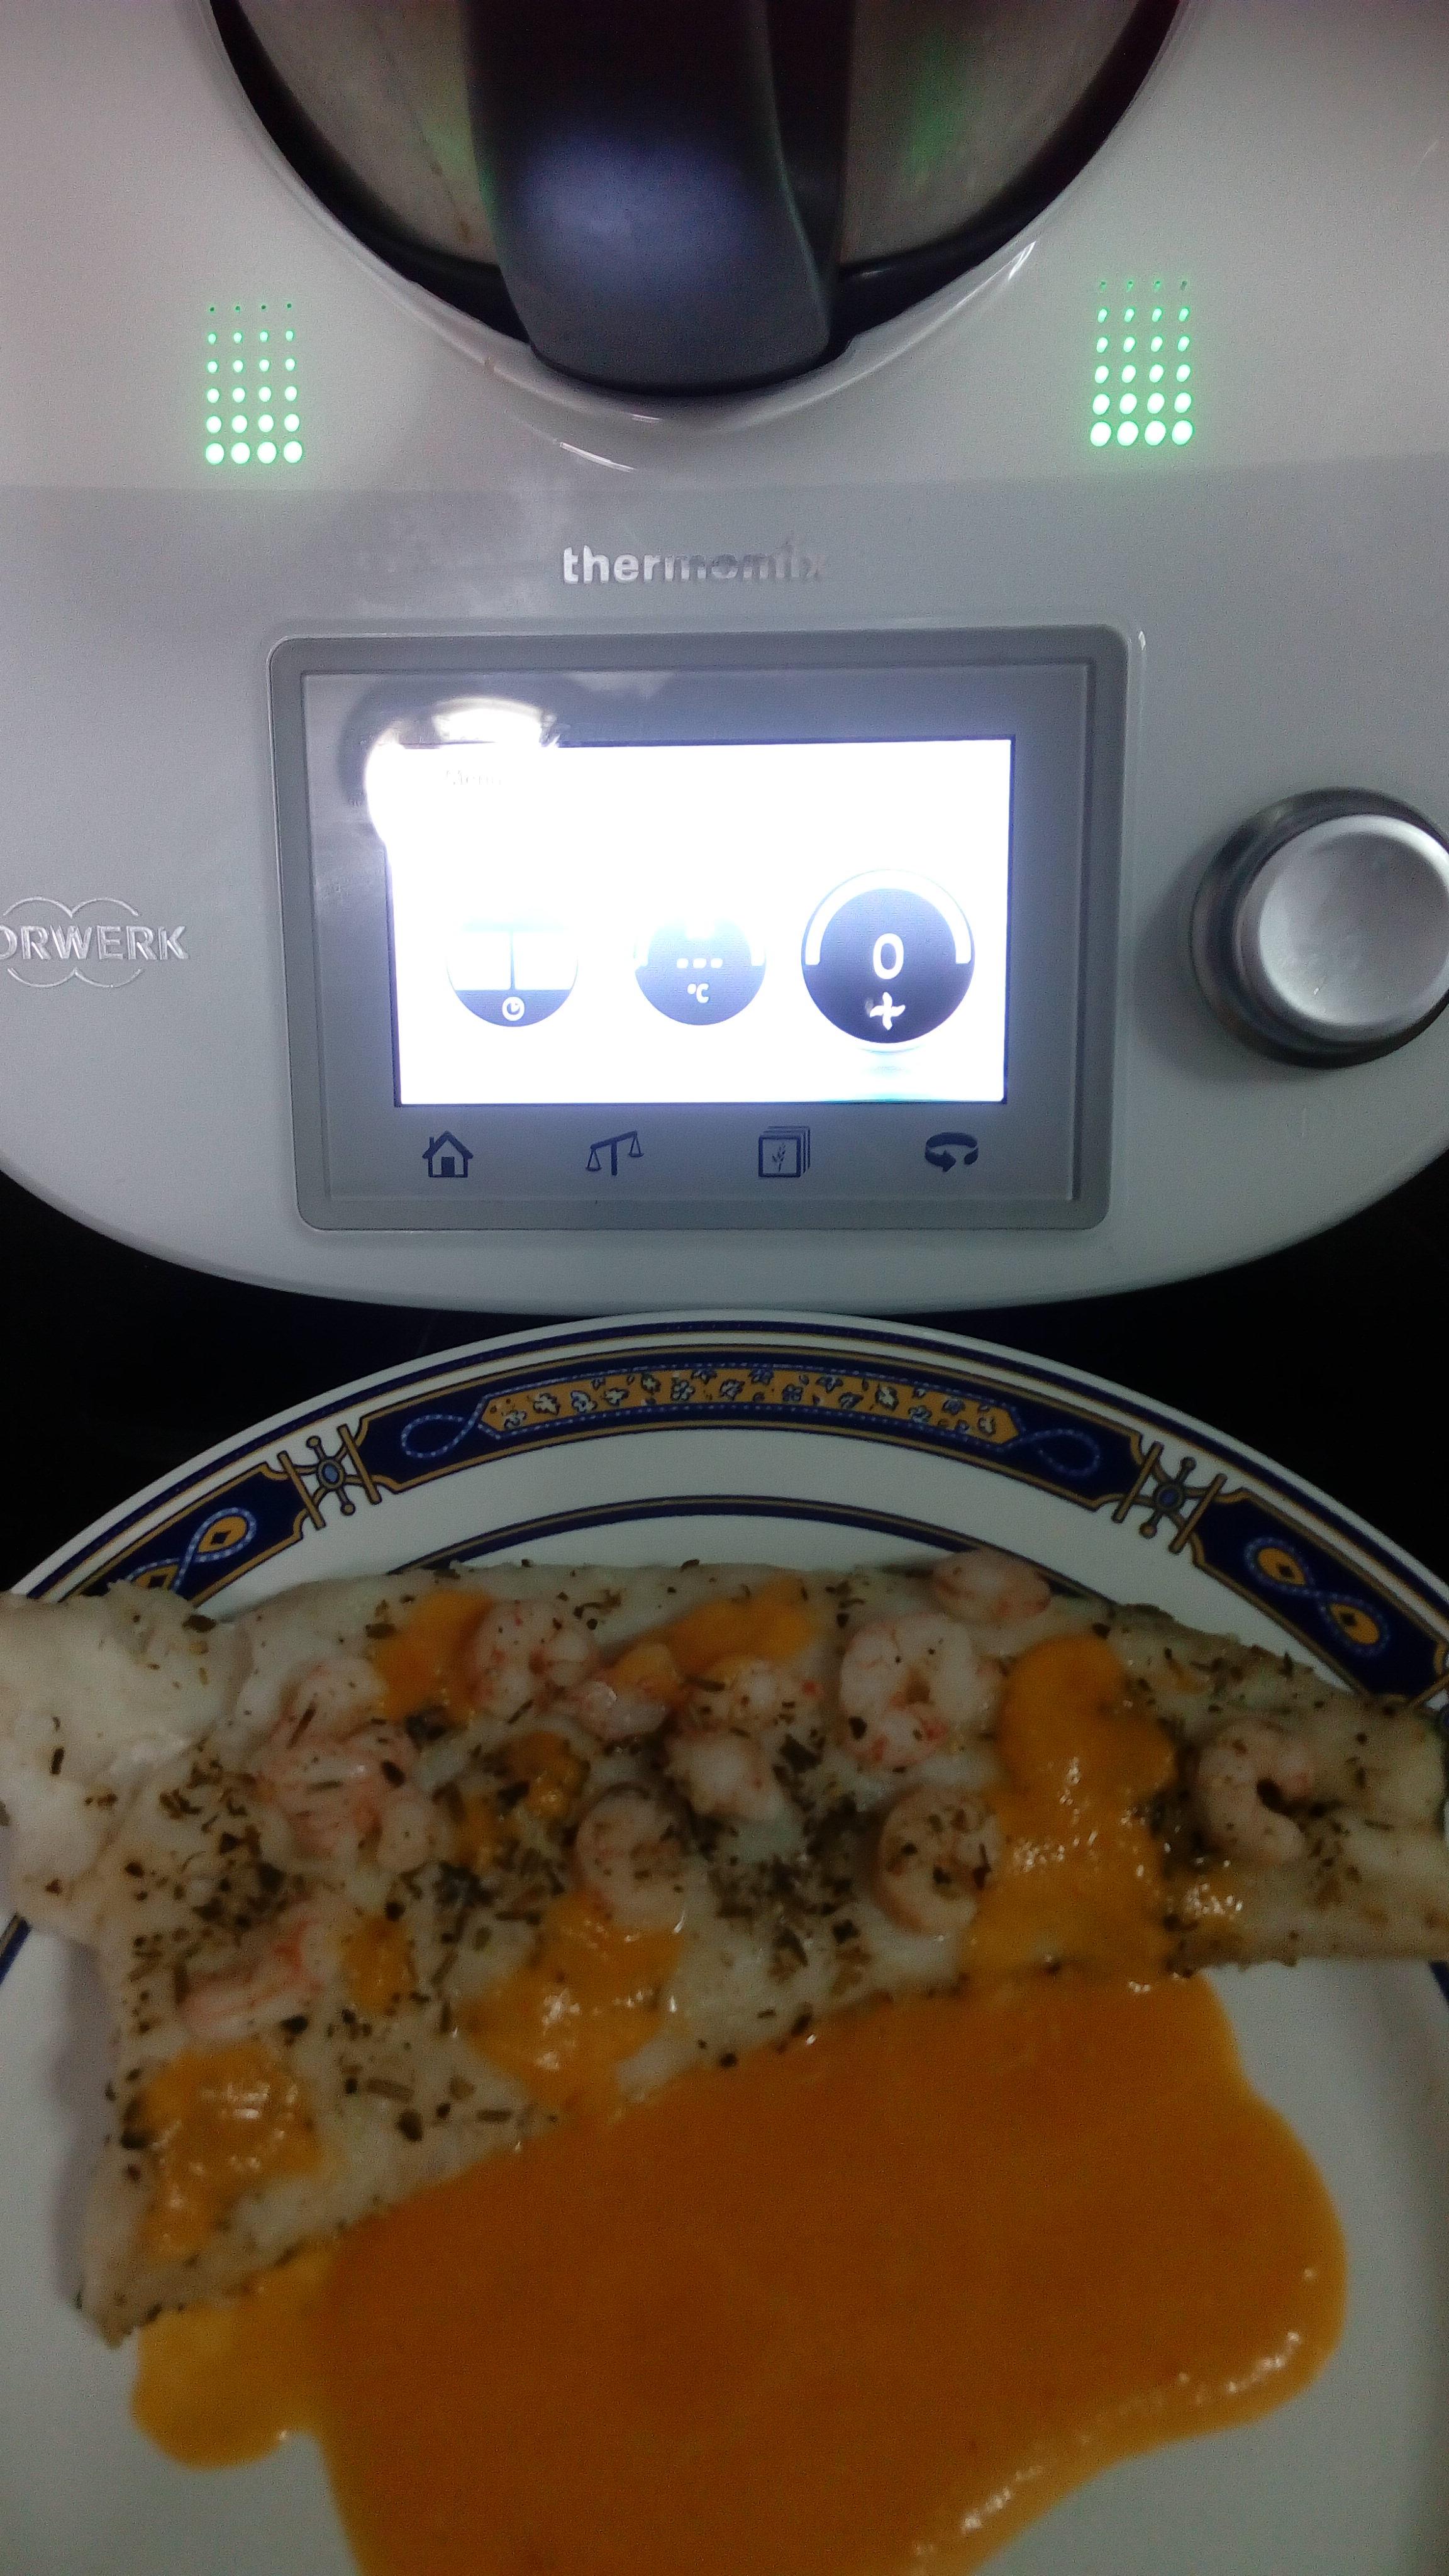 Merluza con gambas y salsa de zanahoria en Thermomix®